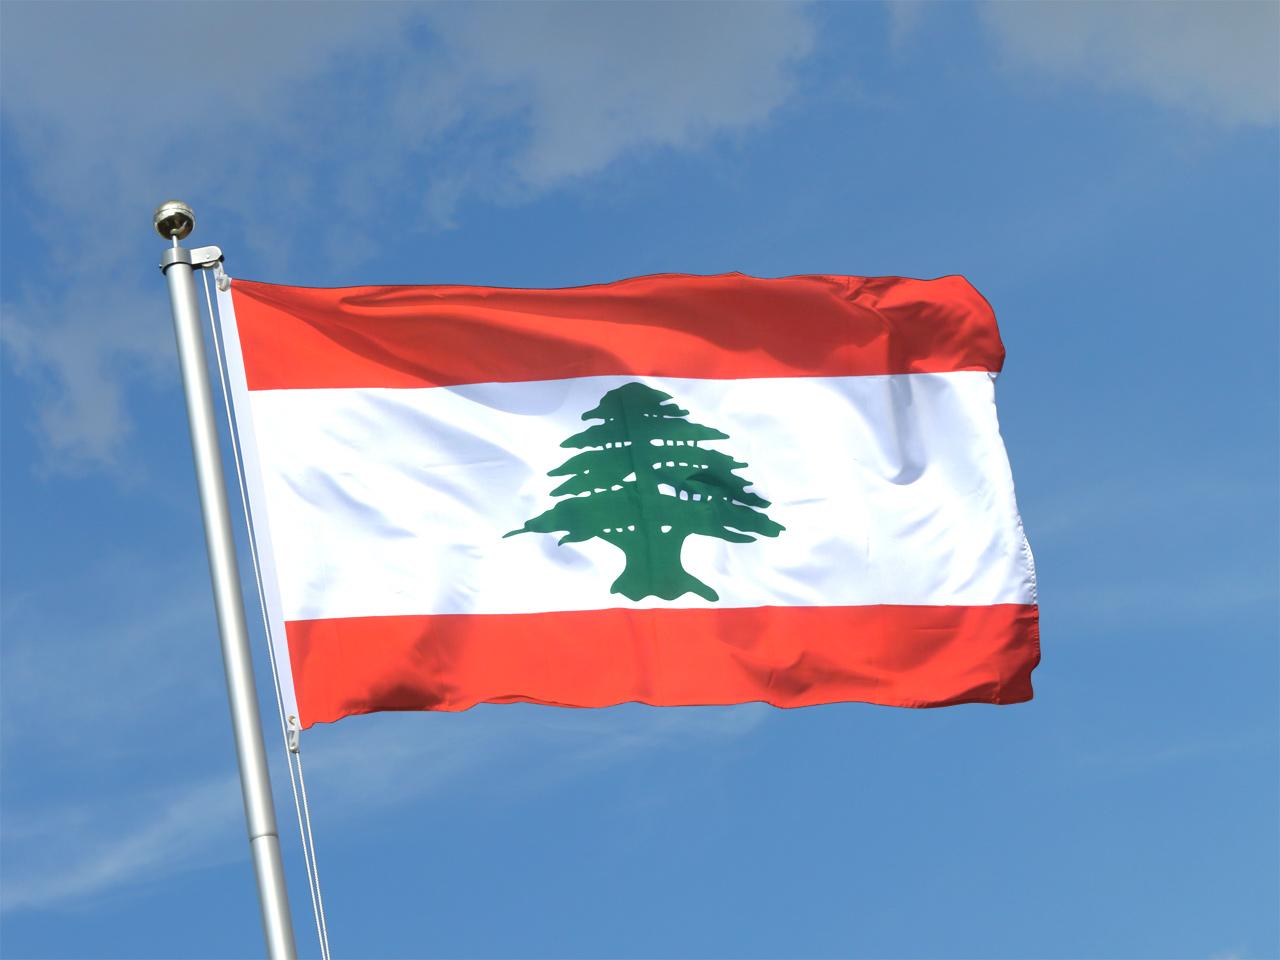 libanon flagge kaufen 90 x 150 cm flaggenplatz online shop. Black Bedroom Furniture Sets. Home Design Ideas